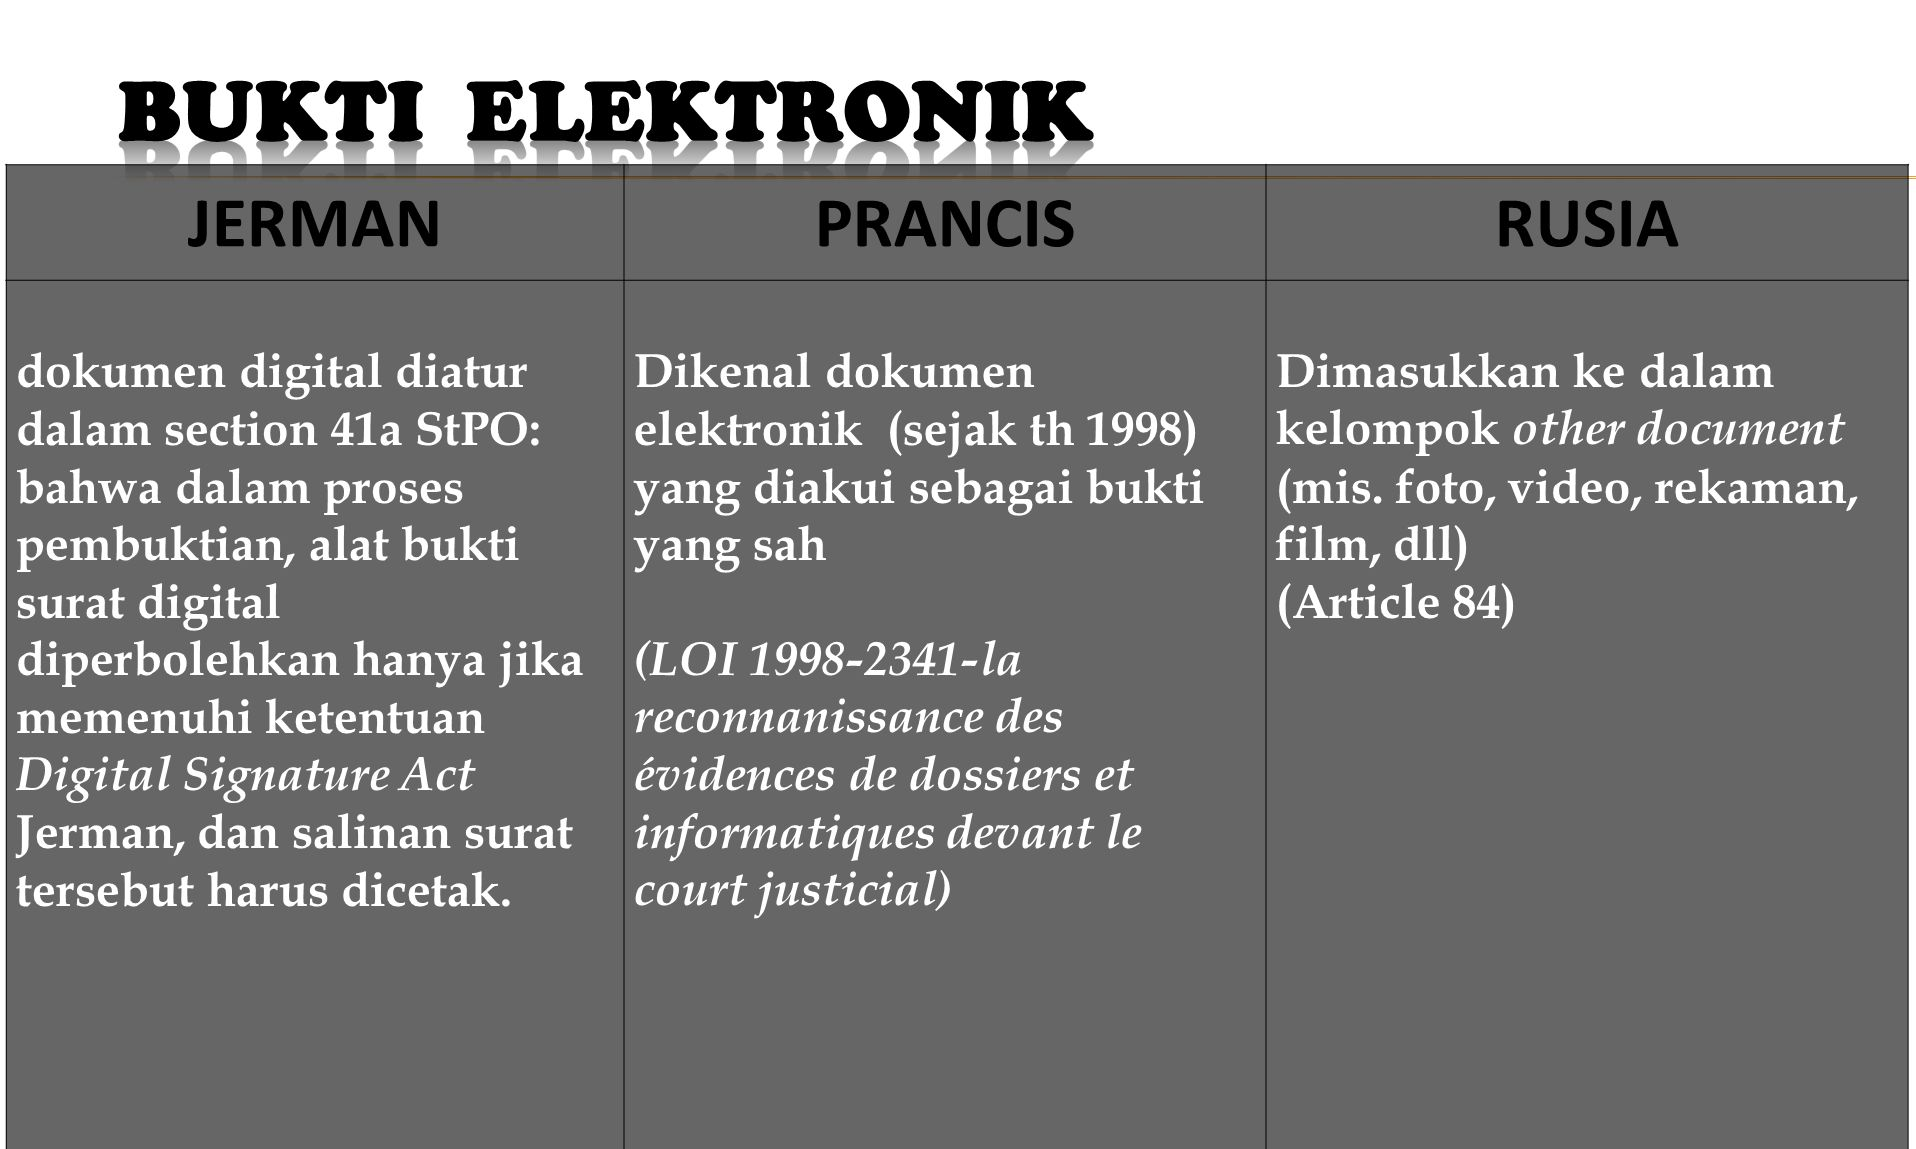 bukti elektroniki elektronik